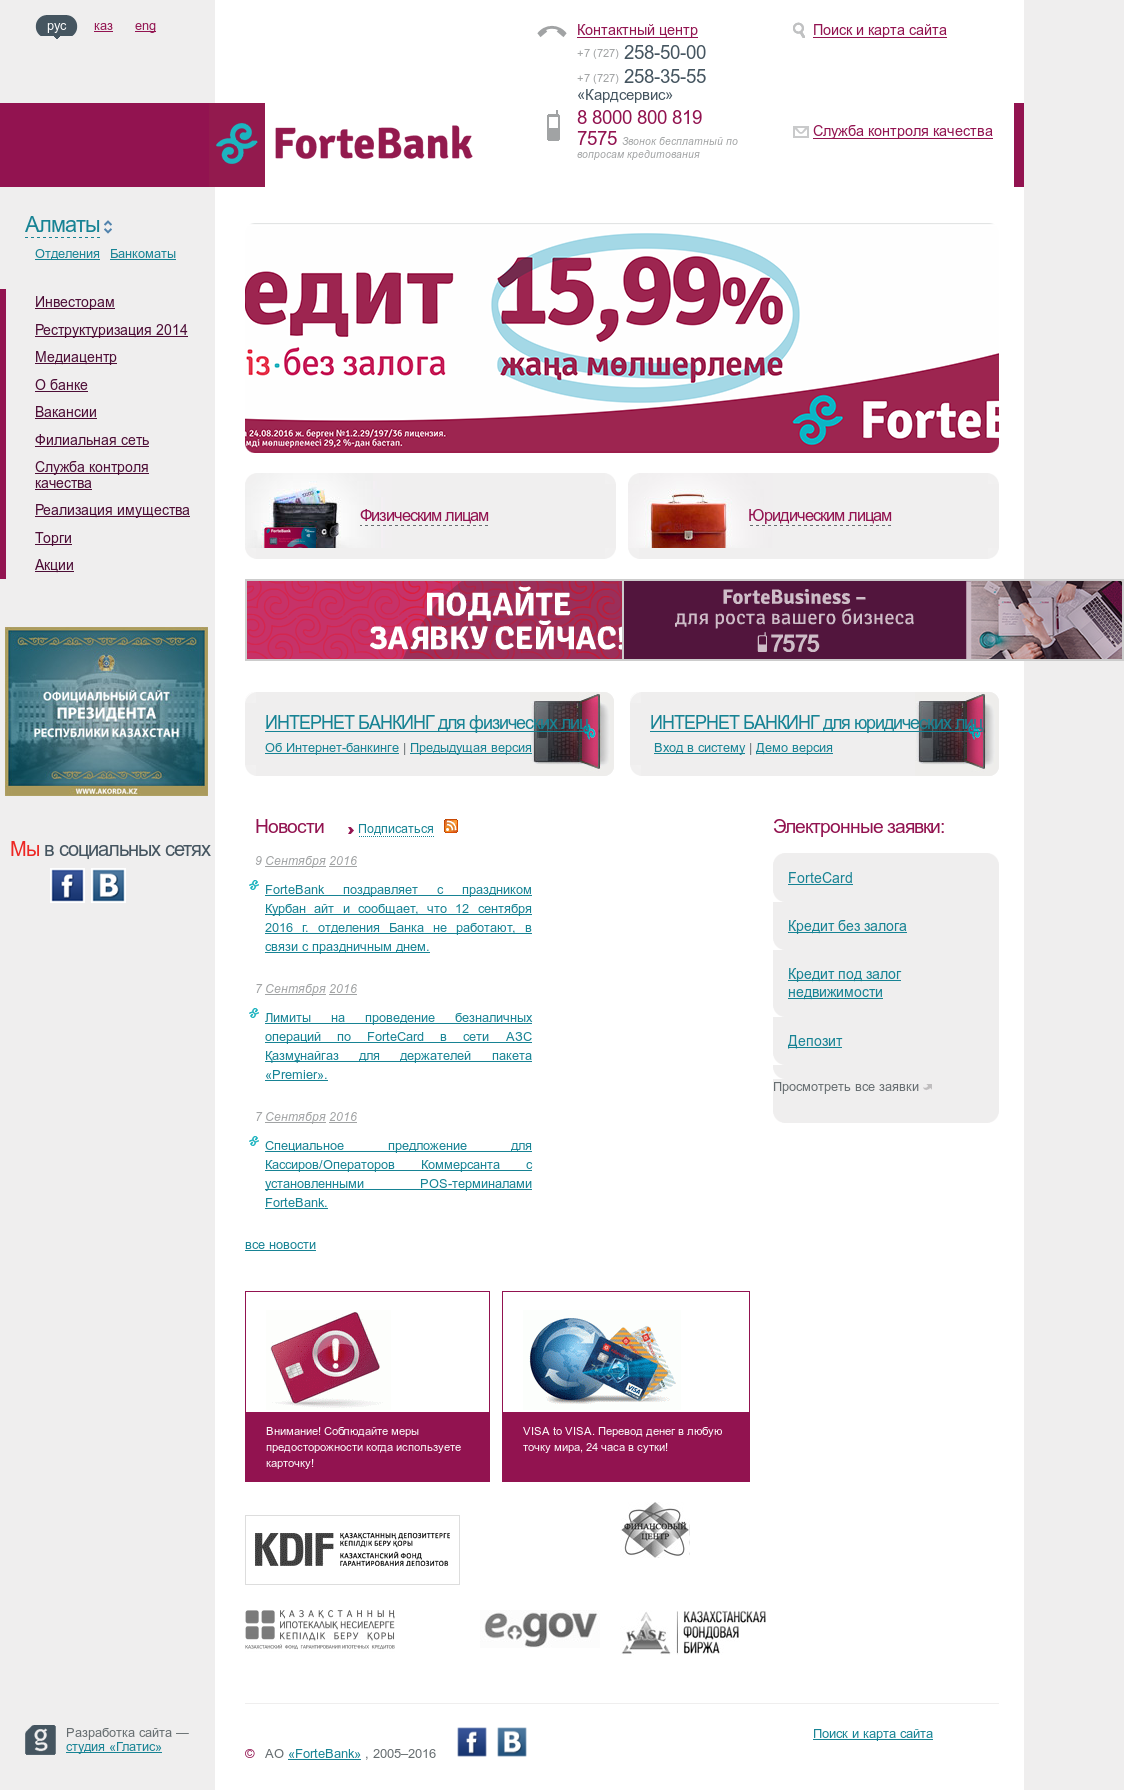 Fortebank online dating